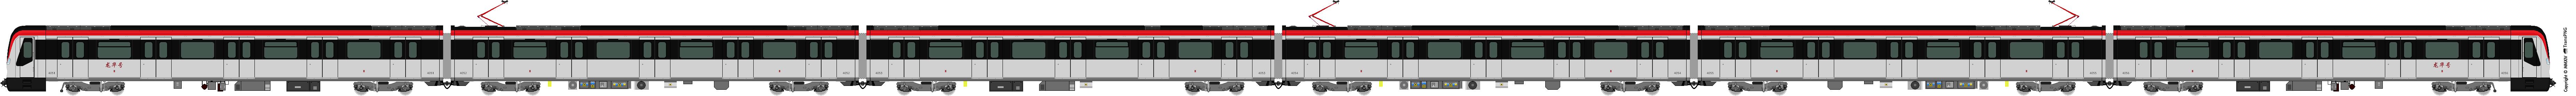 [5399] 港鉄軌道交通(深セン) 5399